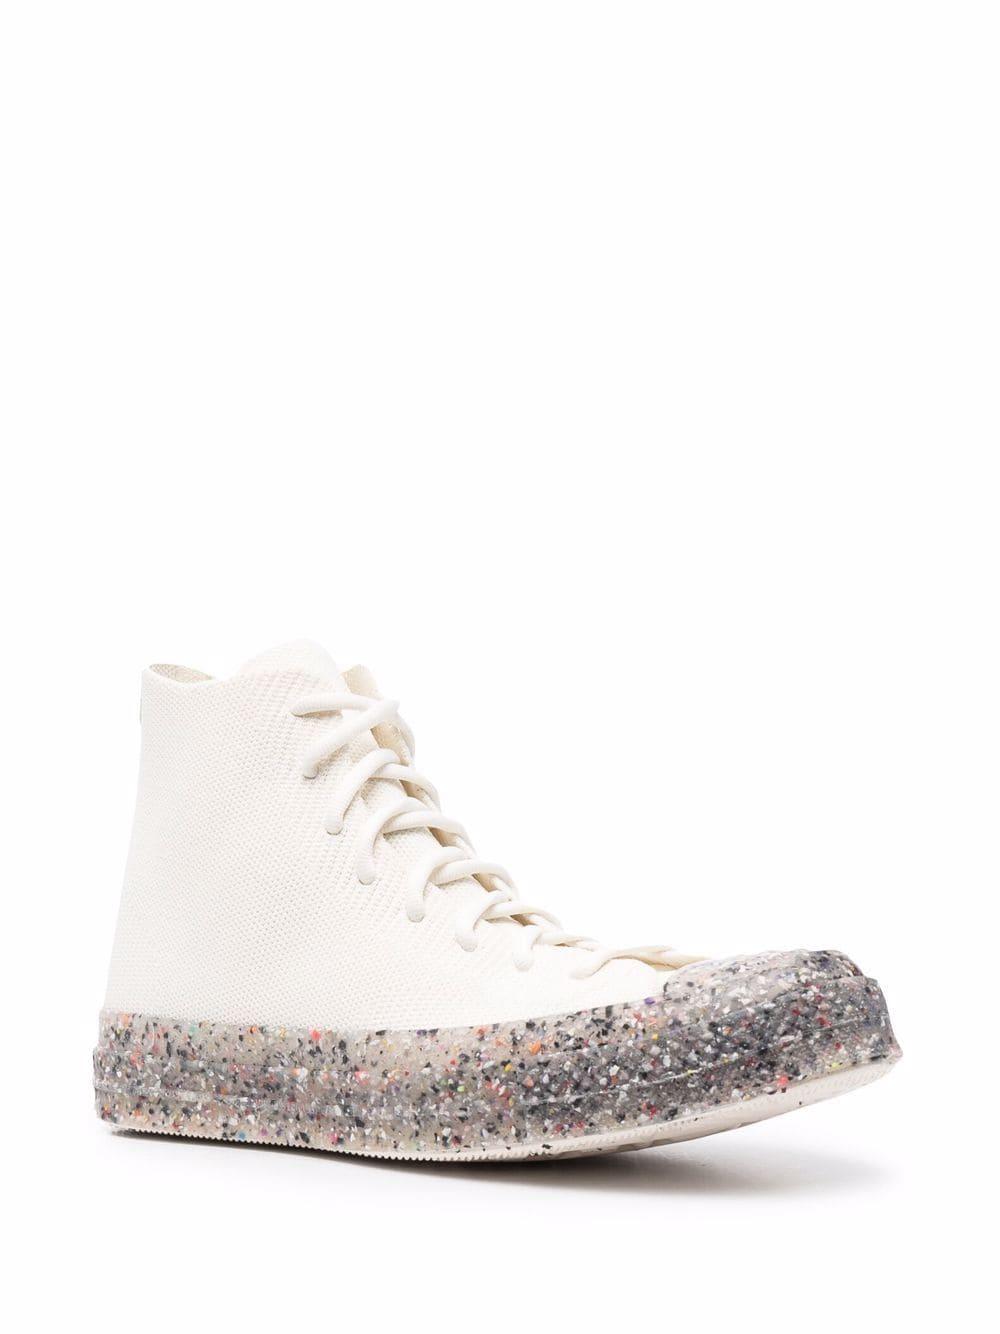 Converse chuck 70 sneakers man CONVERSE | Sneakers | 170864C115